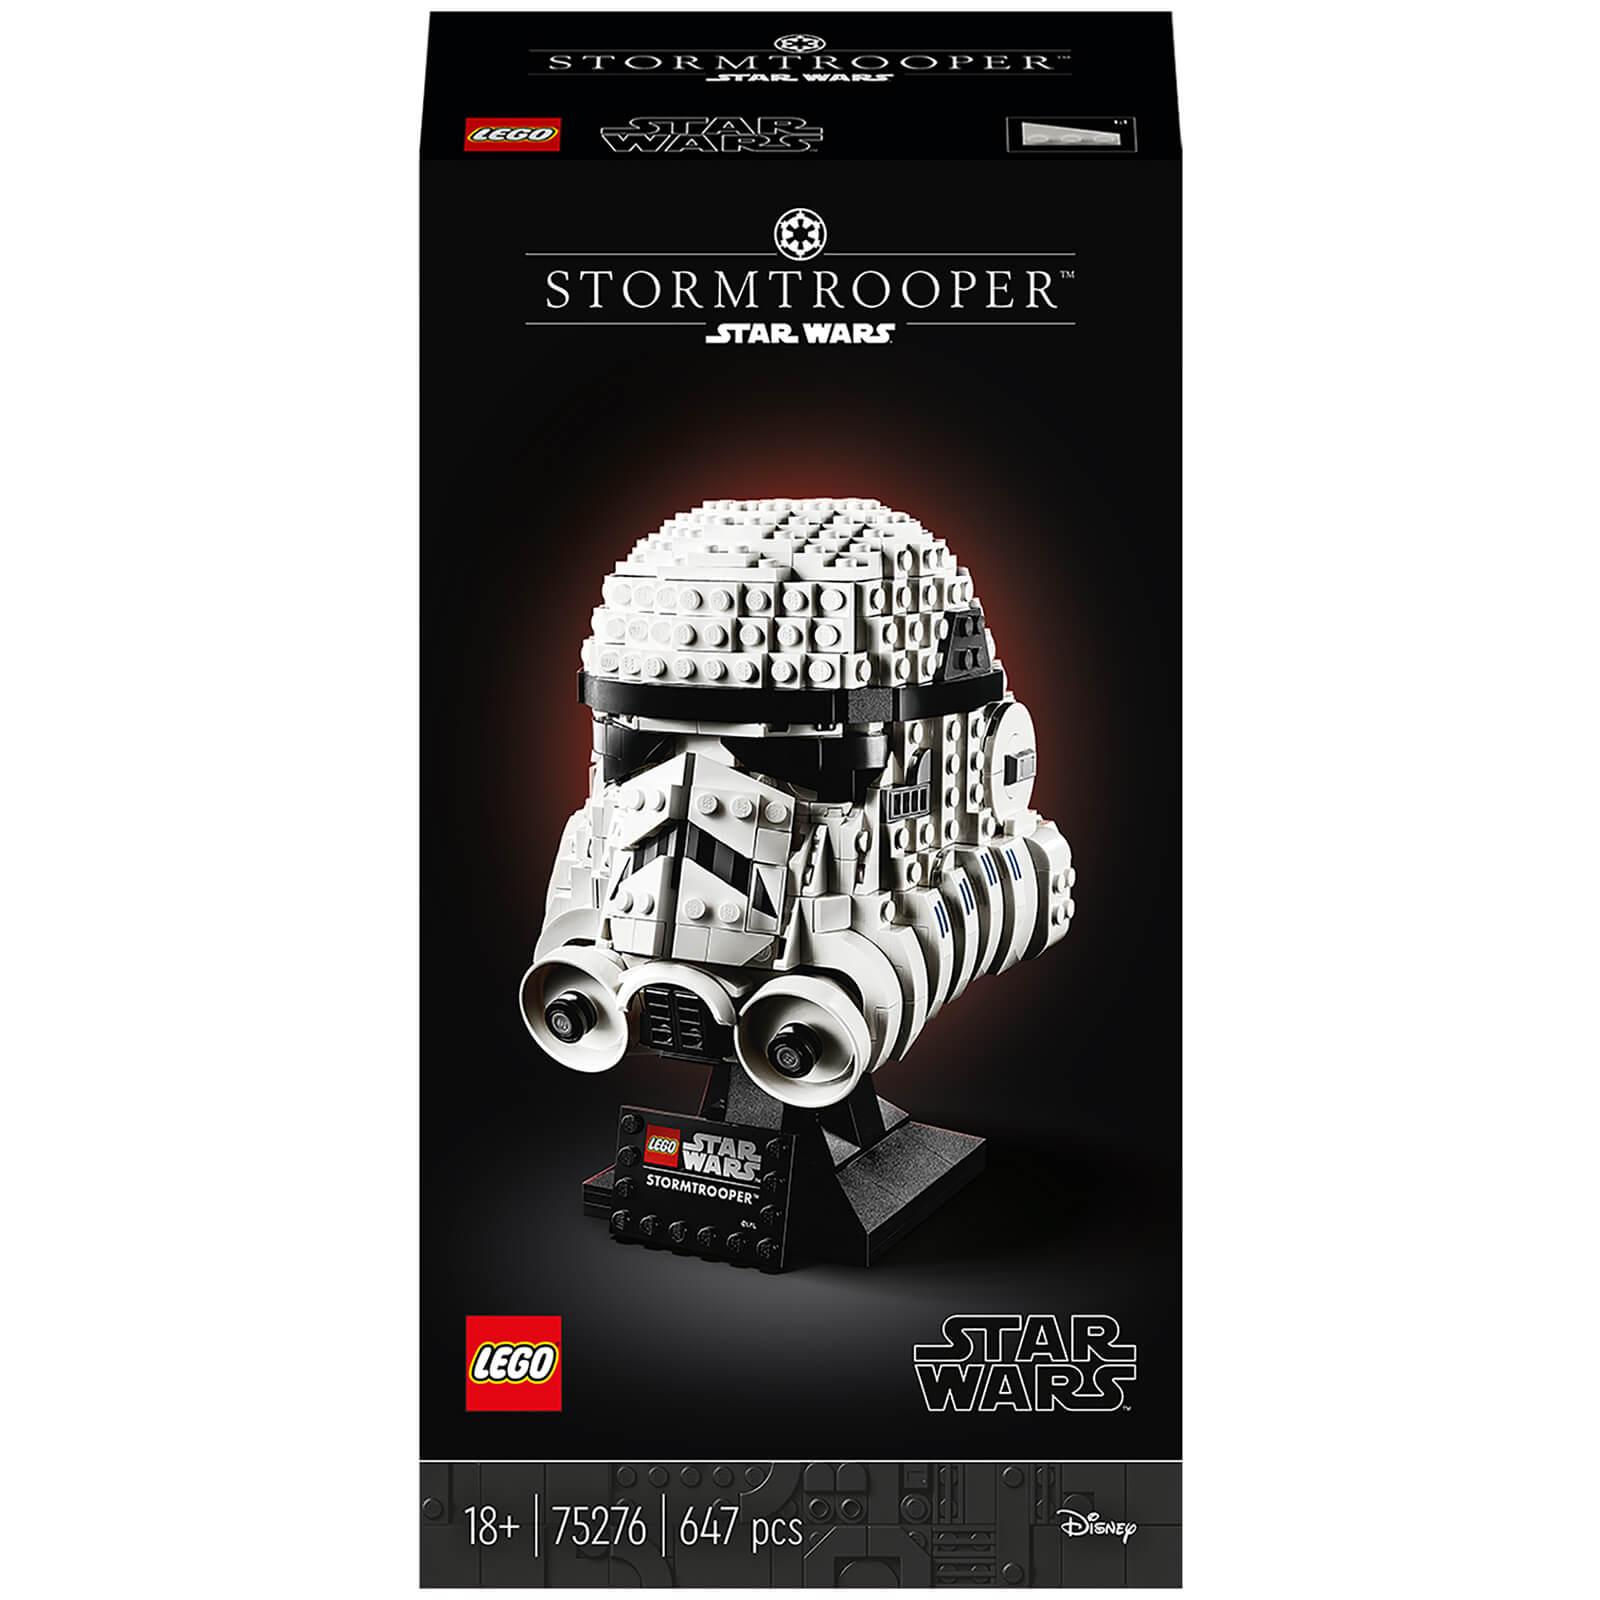 LEGO Star Wars 75276 Stormtrooper Bust- £47.99 Delivered @ IWOOT